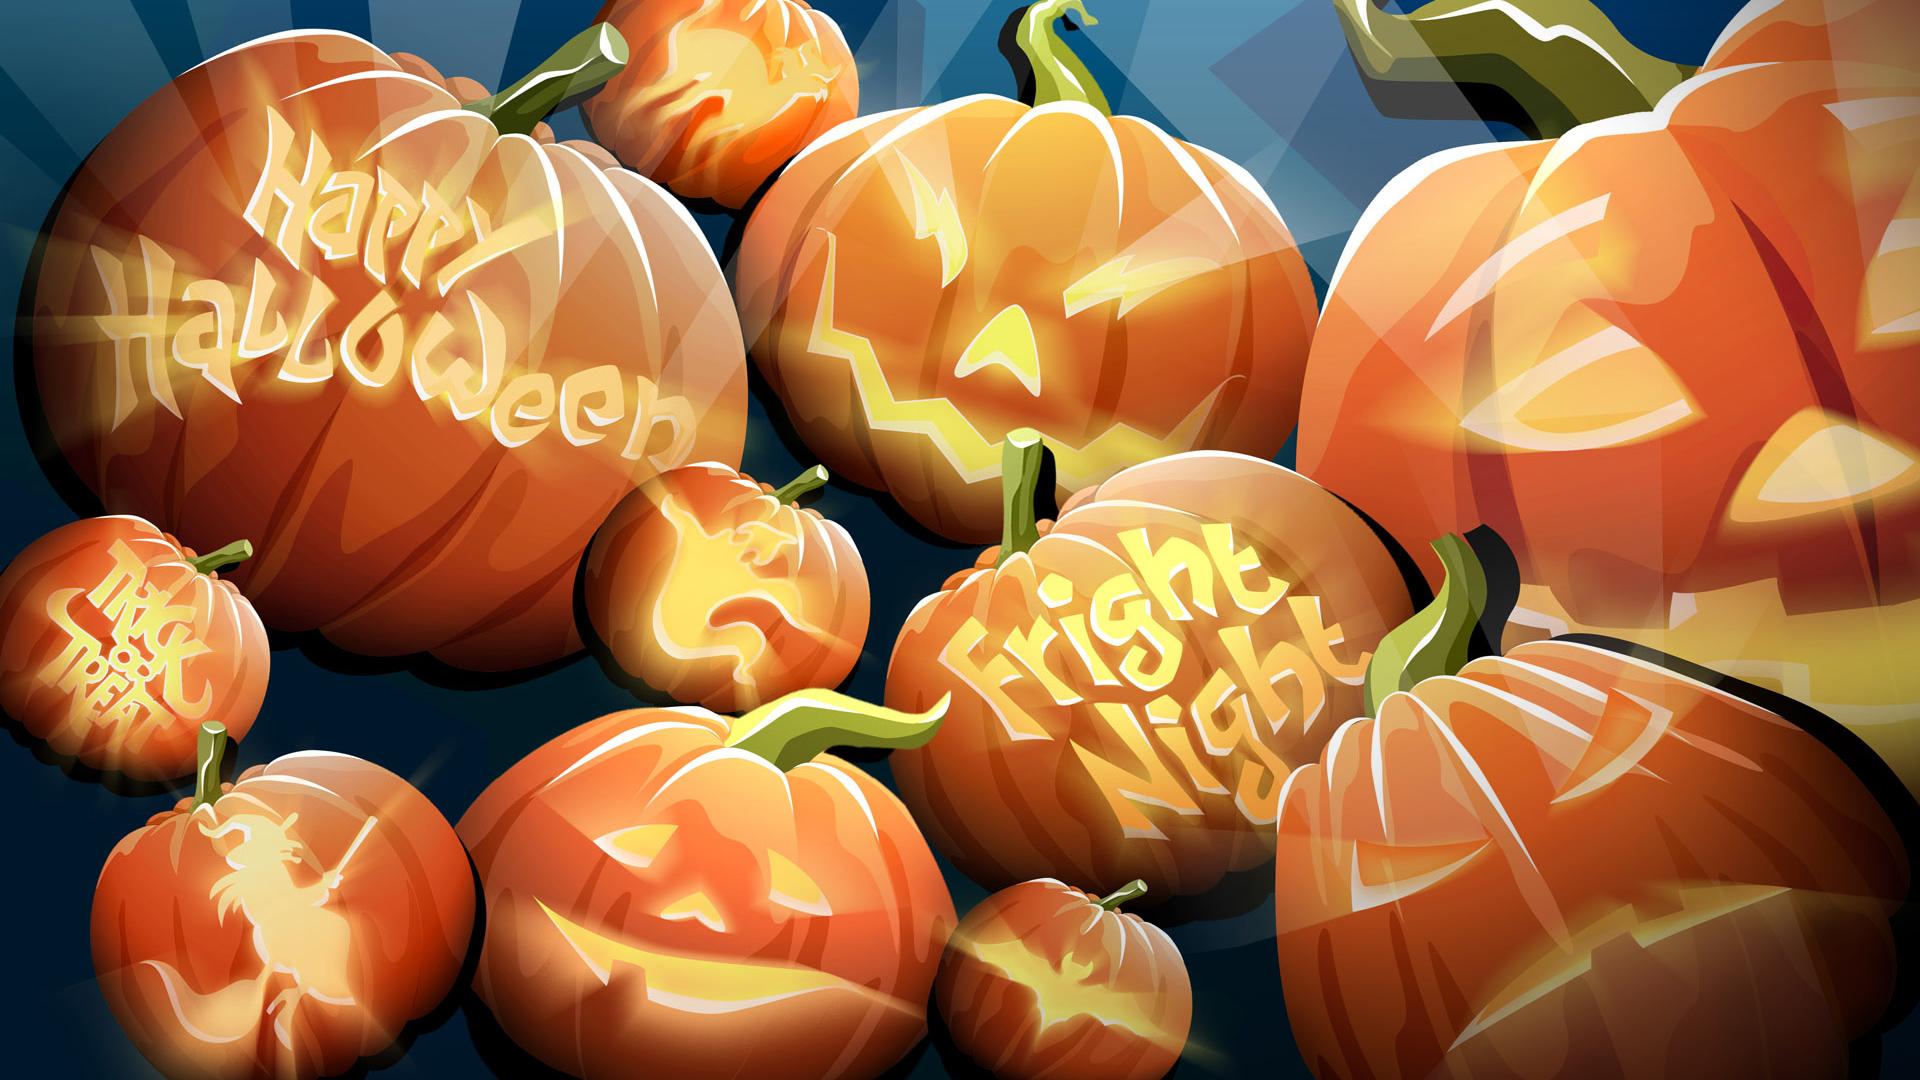 Fall wallpaper backgrounds with pumpkins wallpapersafari